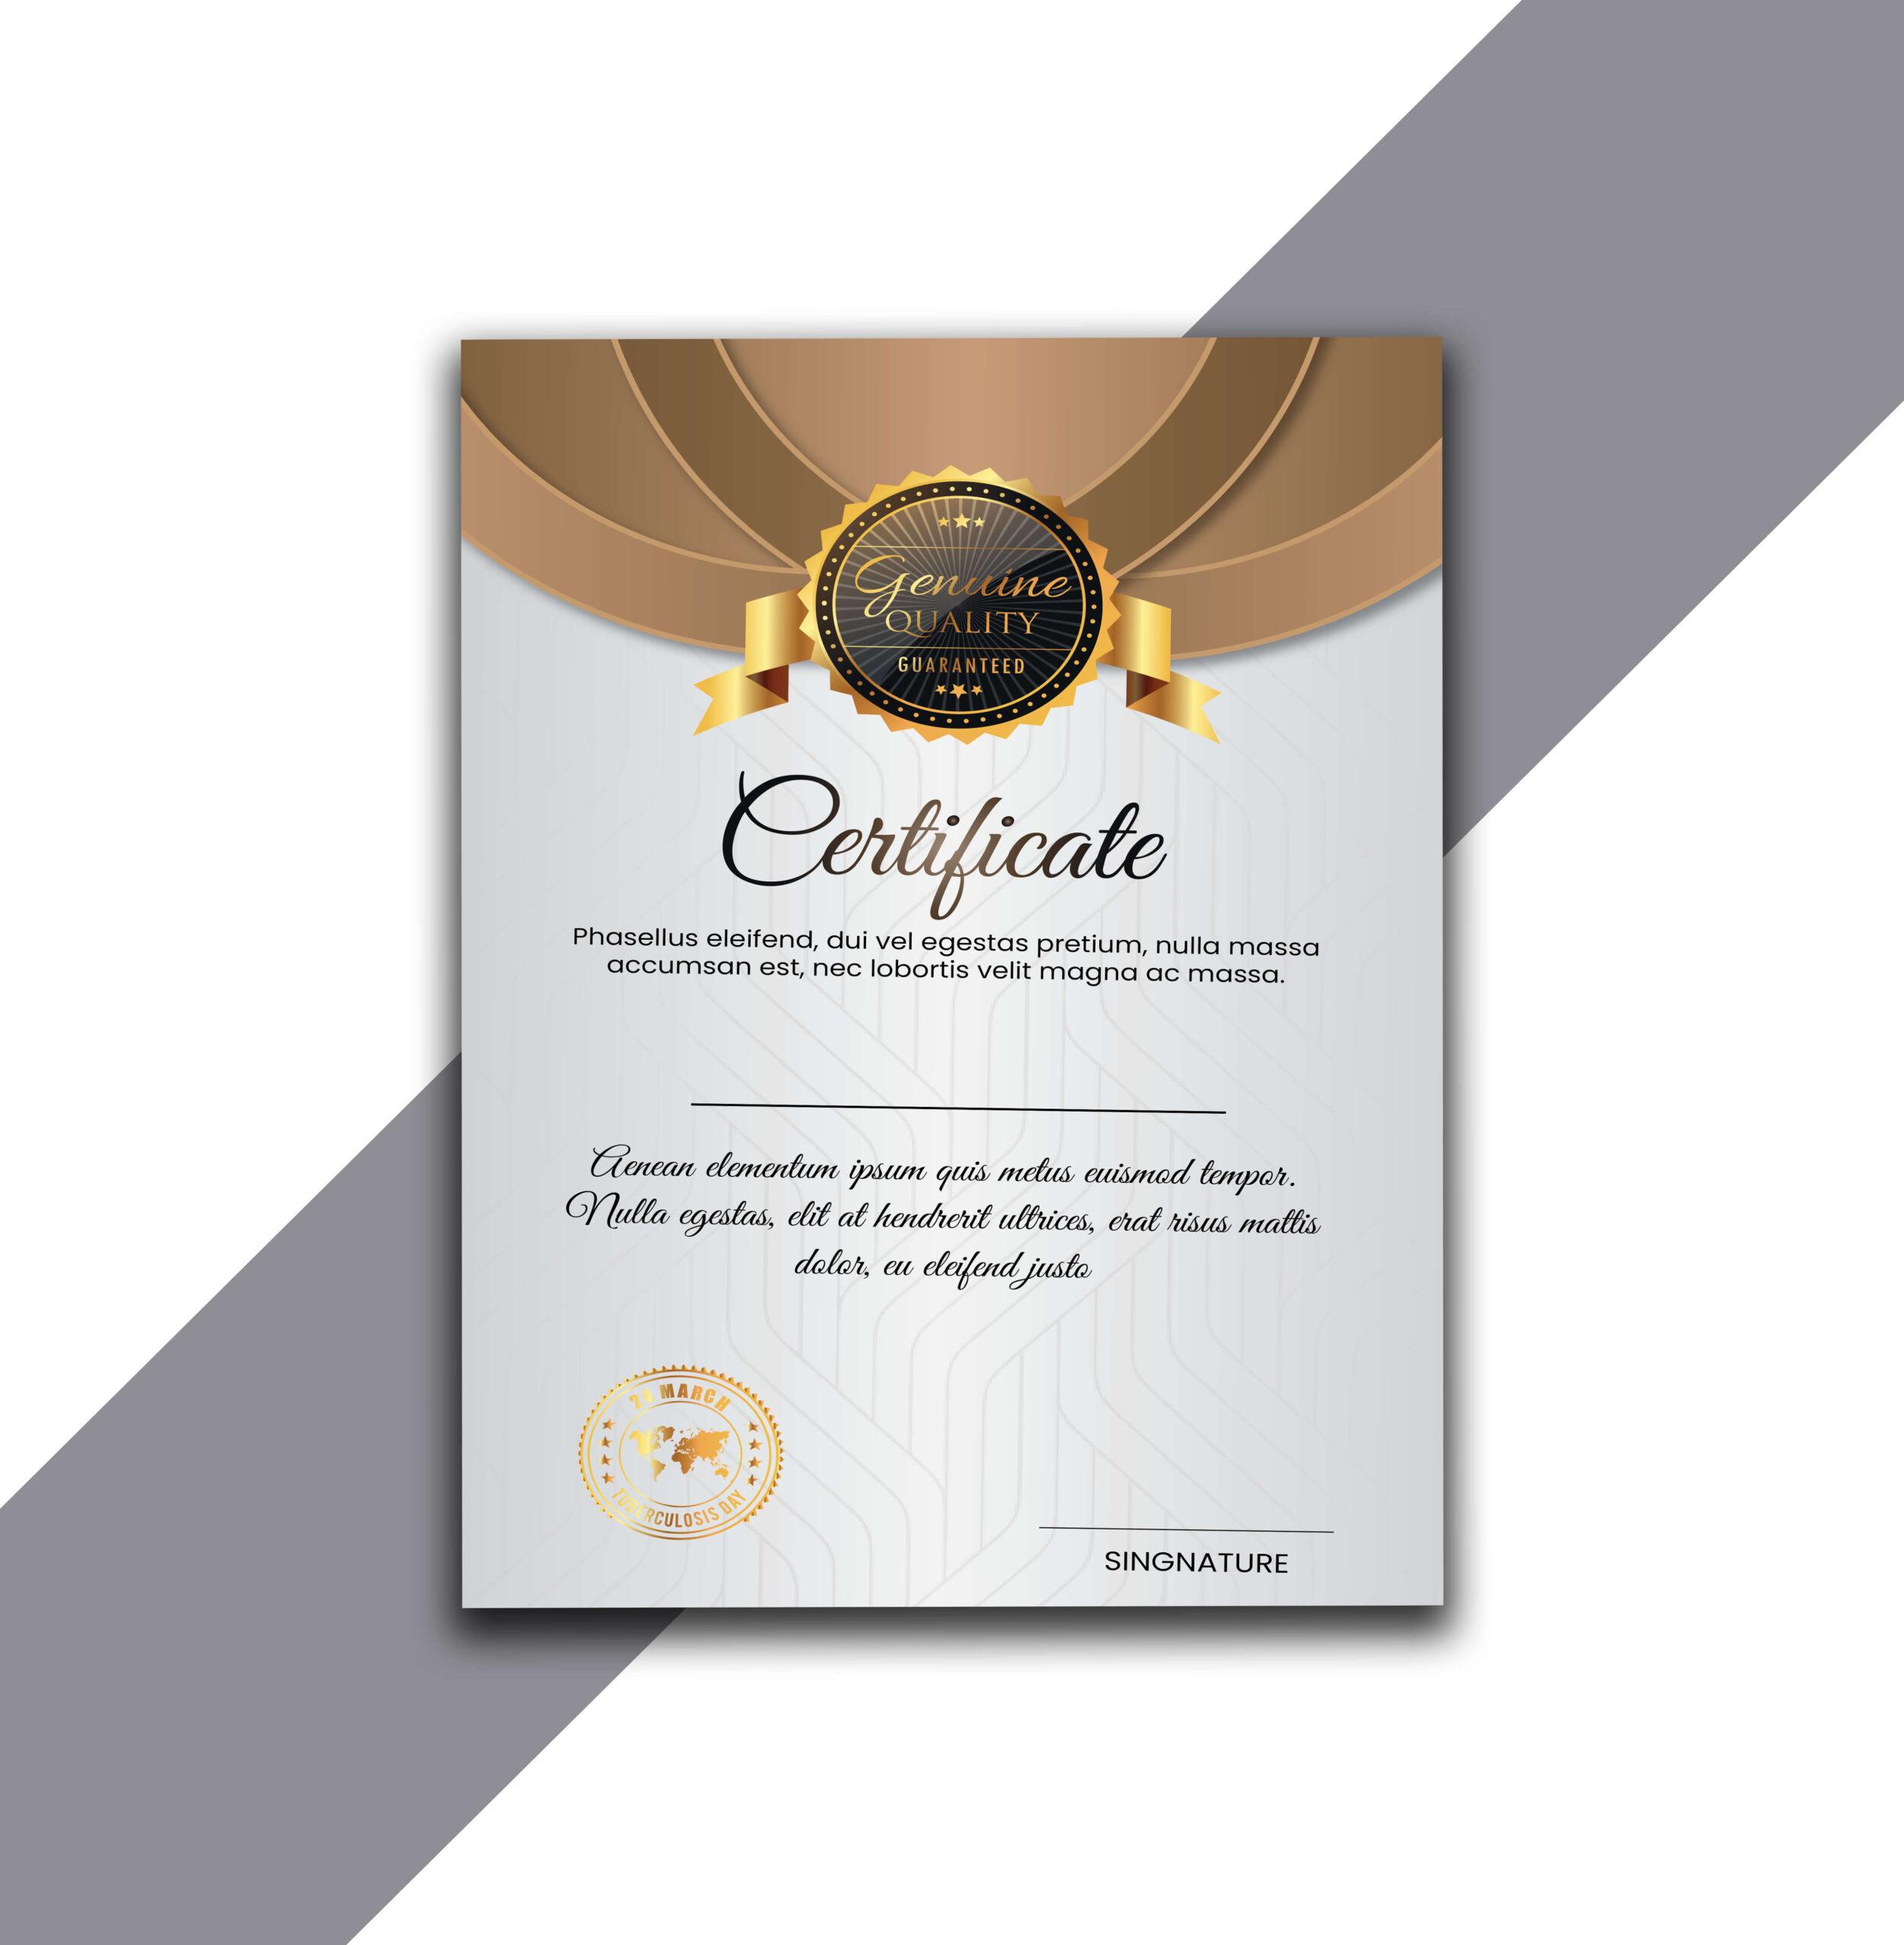 Get Free Certificate Design in Adobe Illustrator